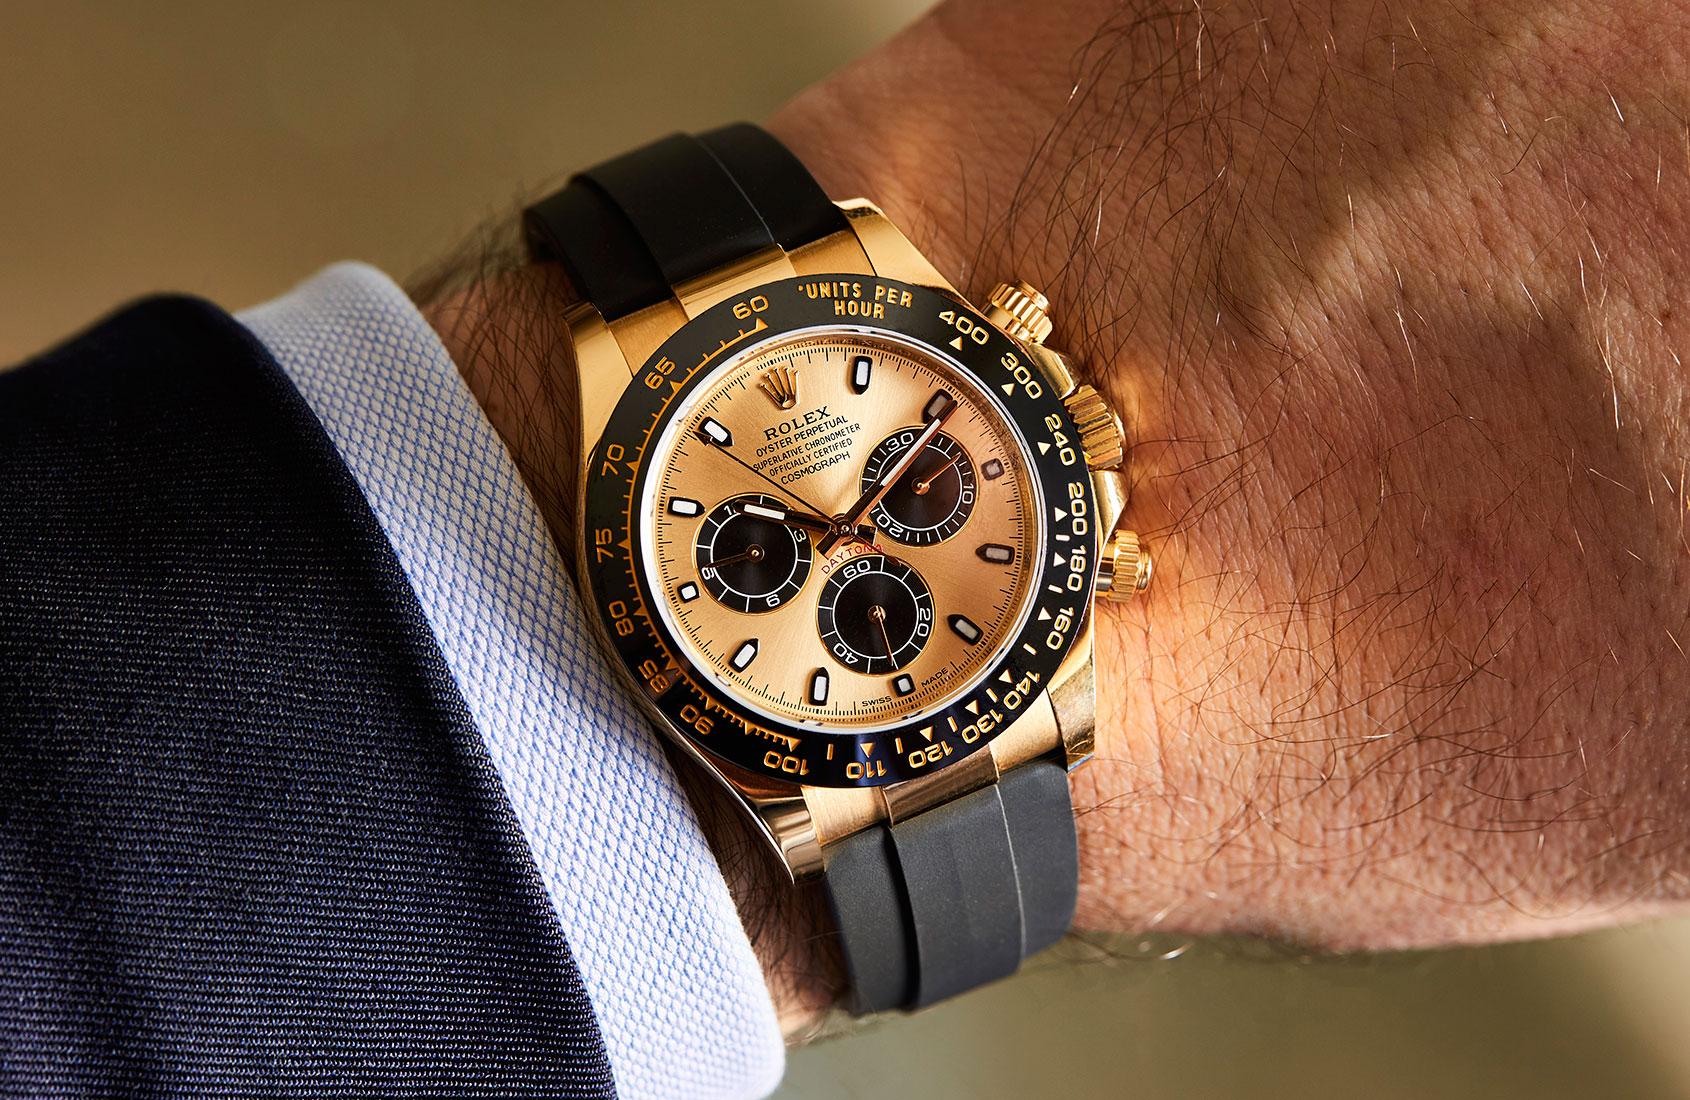 Gold Rolex Daytona On Wrist